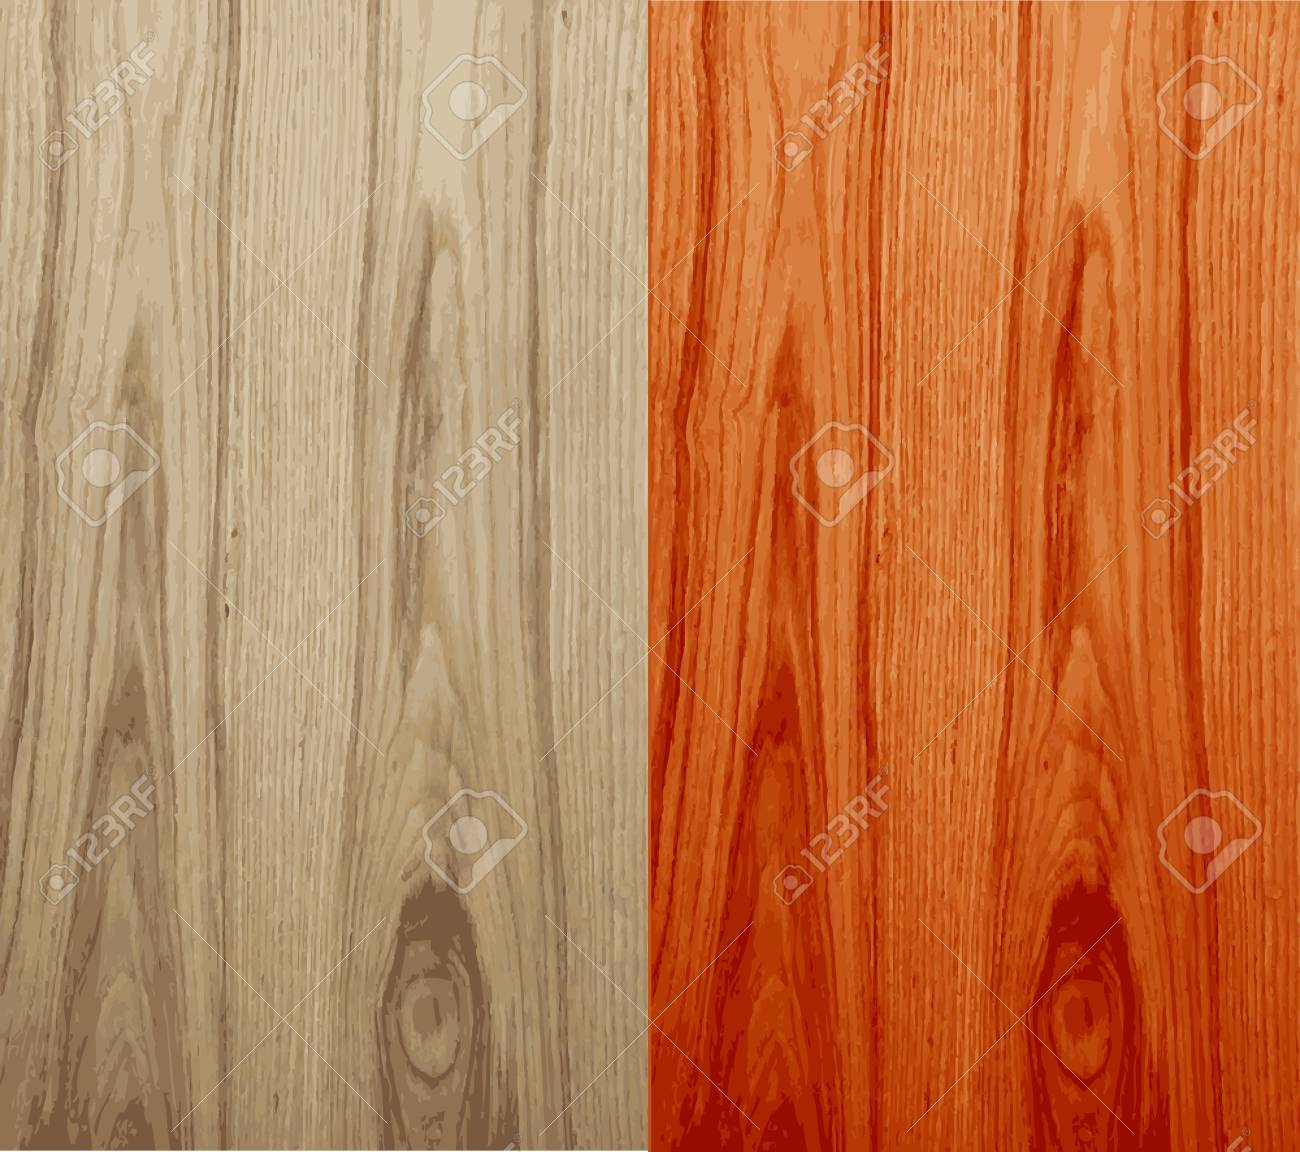 Seamless Vector Wood Stock Vector - 14808096